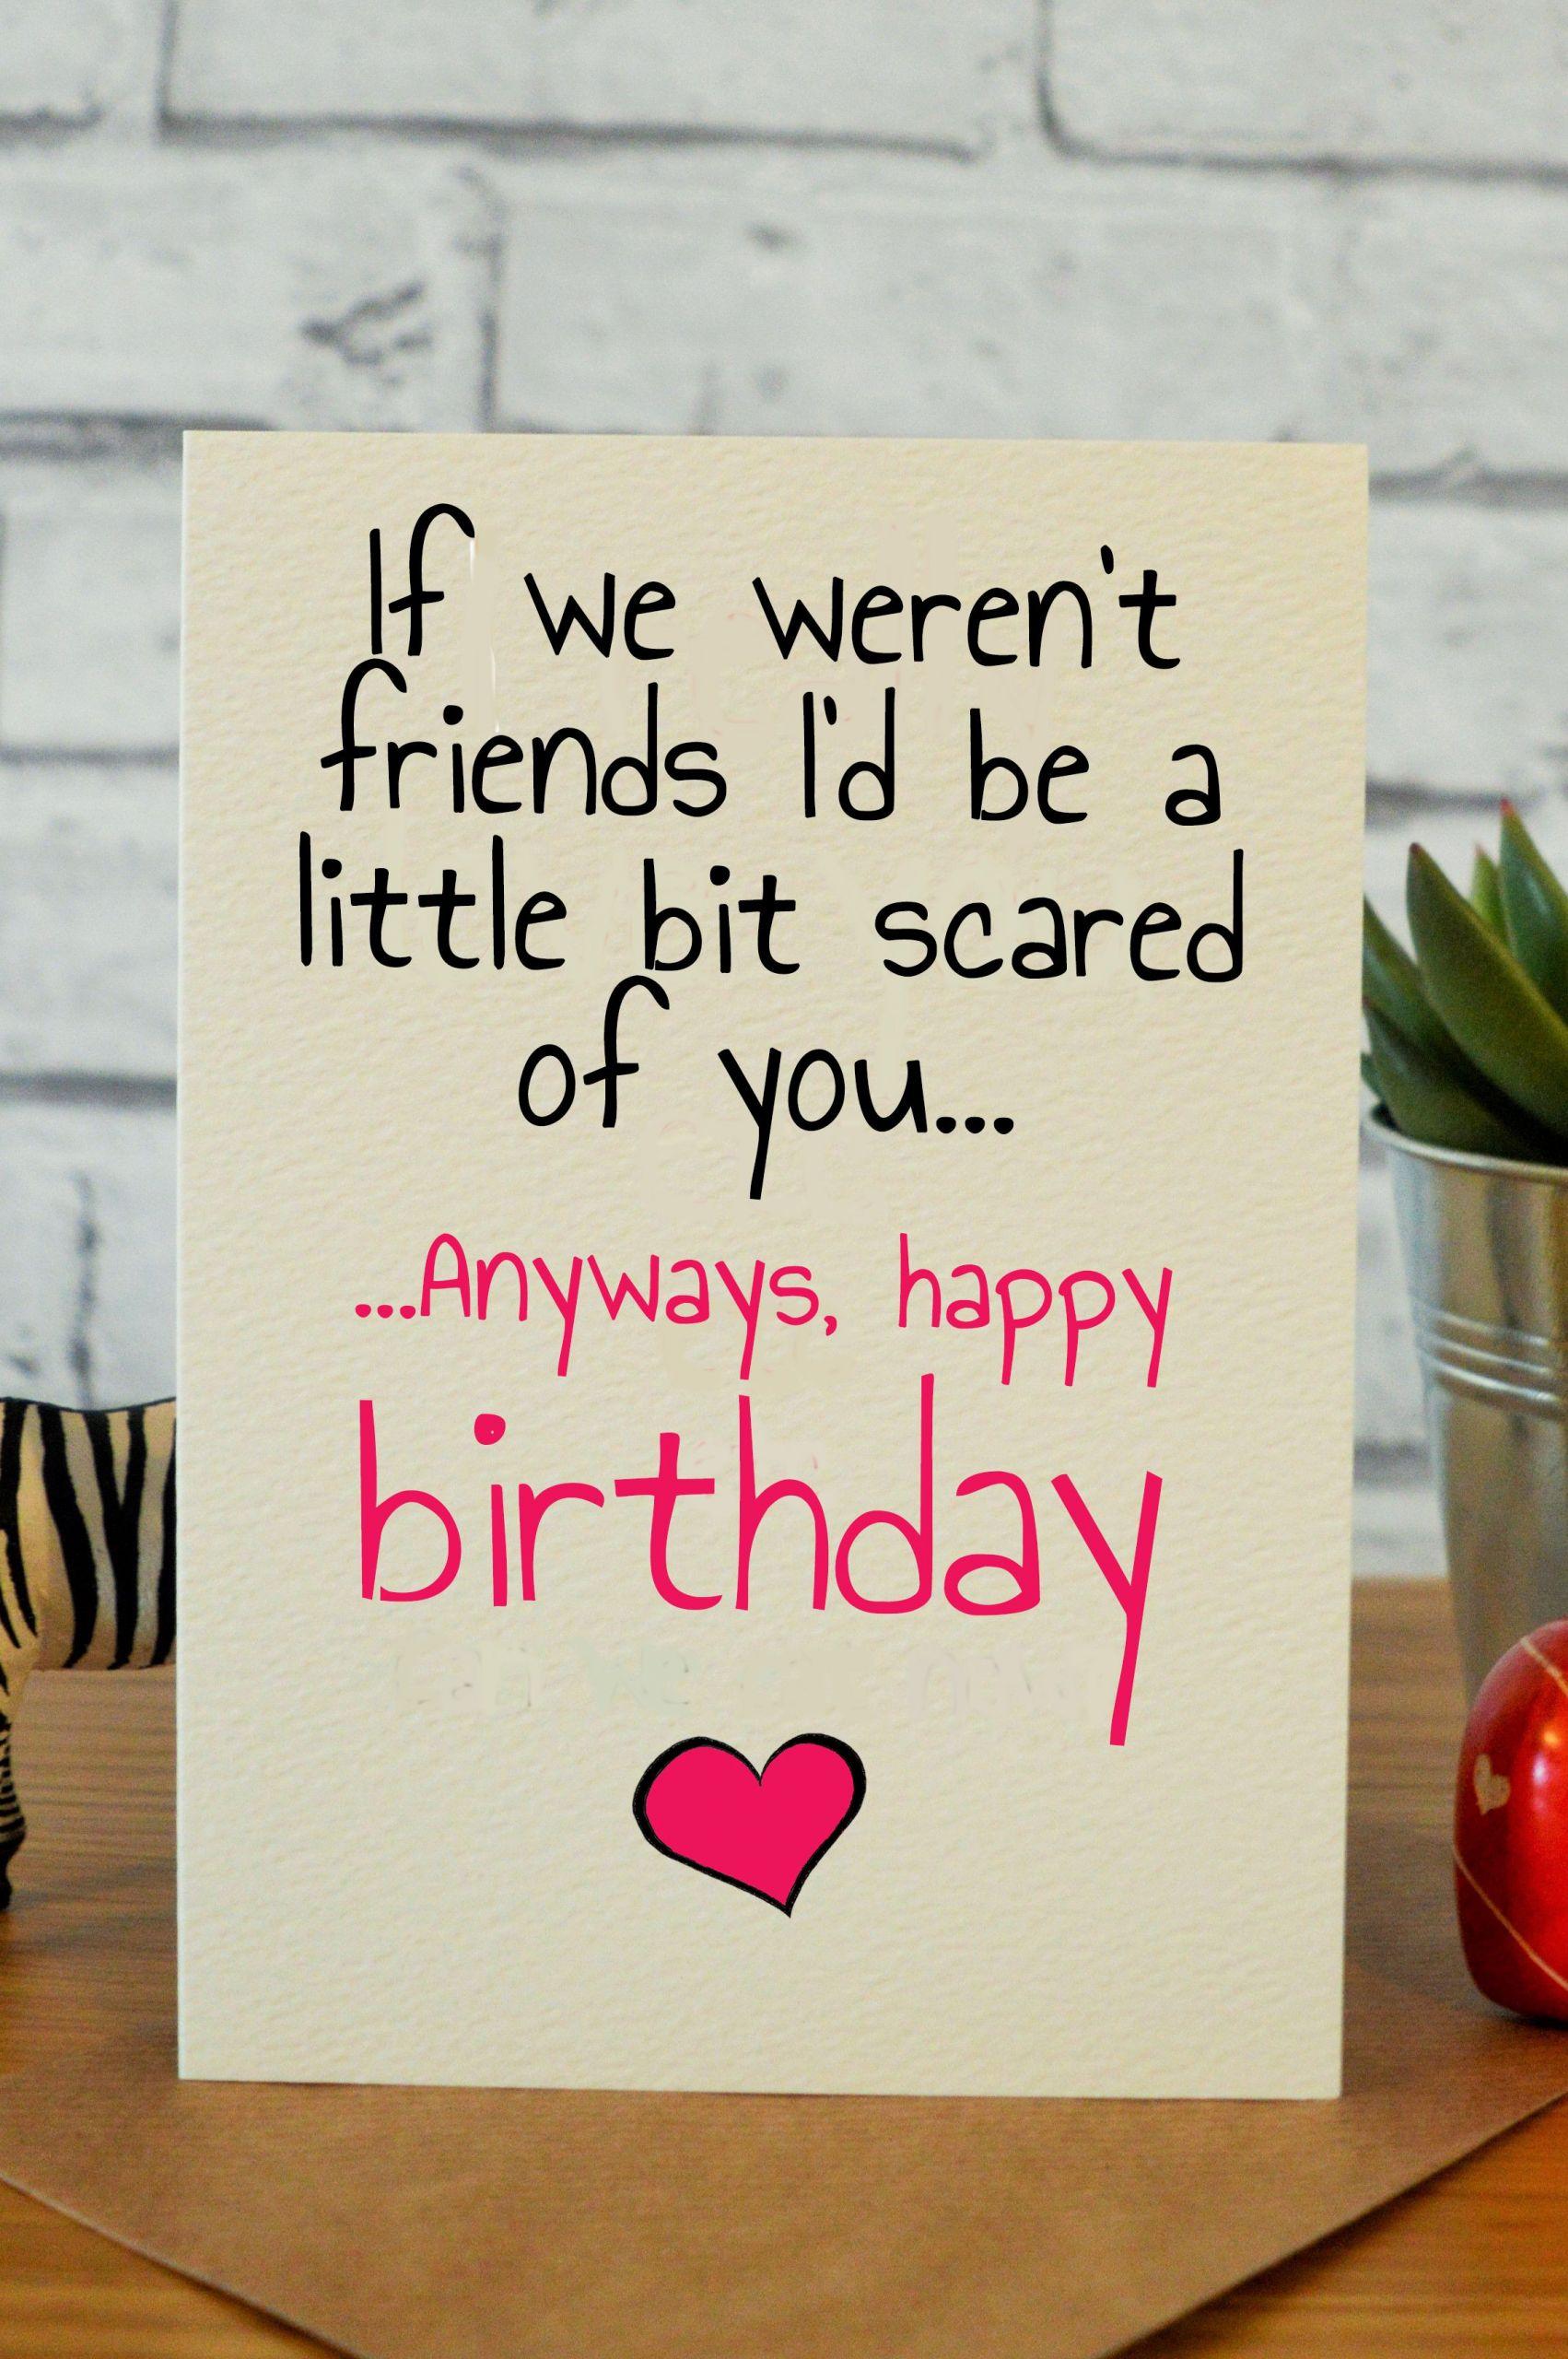 Funny Homemade Birthday Card Ideas  Bit Scared